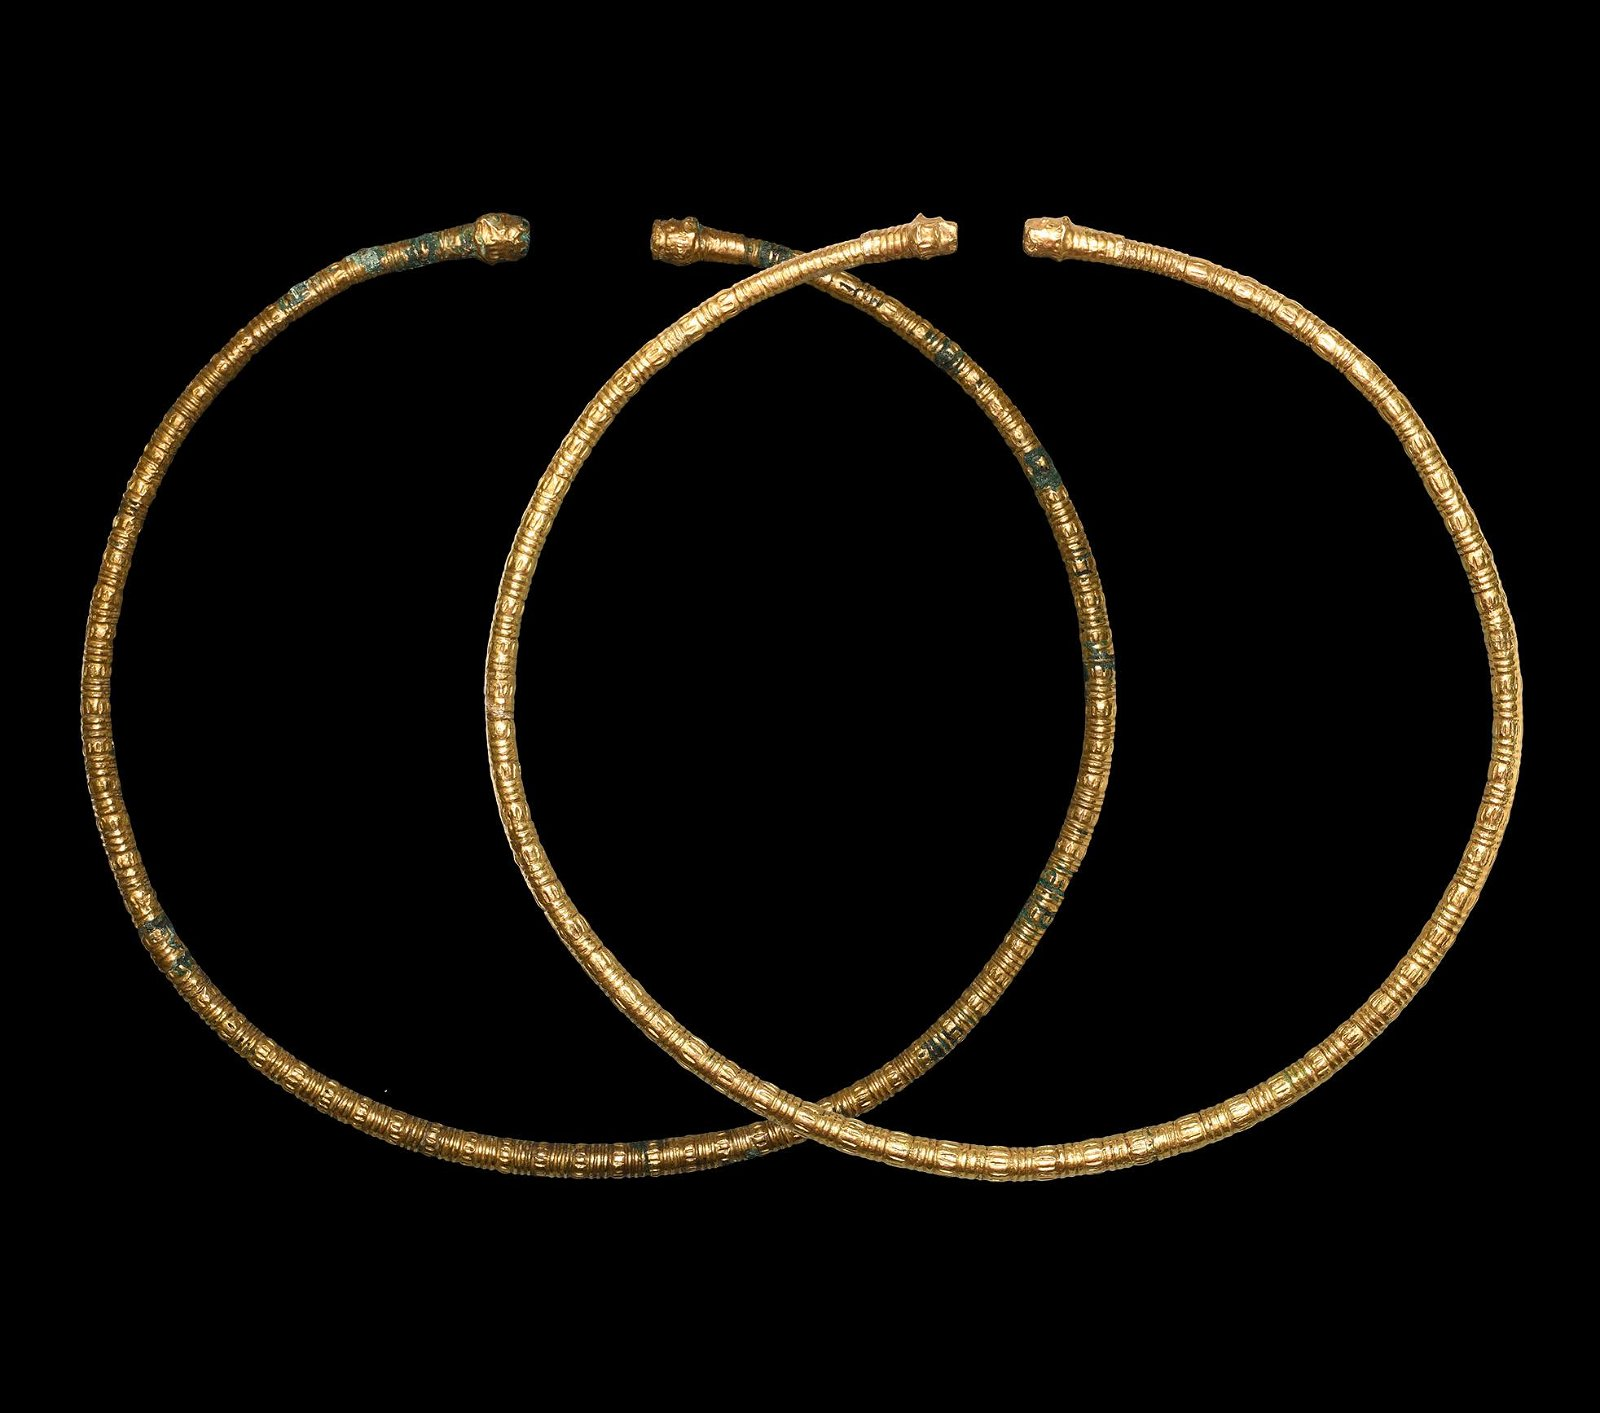 Scythian Gold Clad Torc Pair